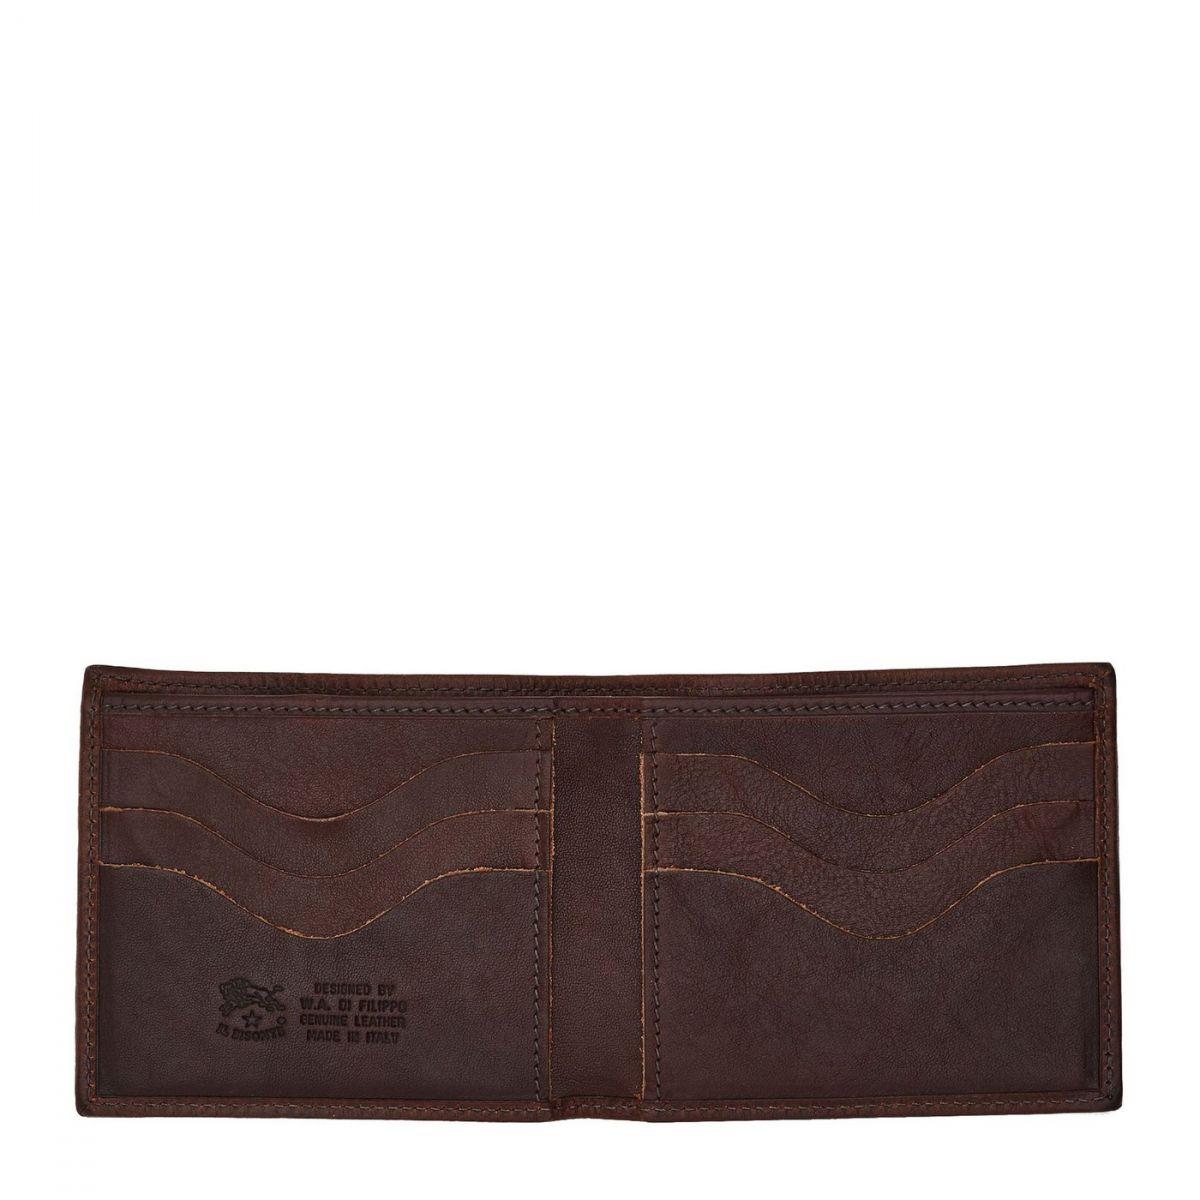 Men's Bi-Fold Wallet in Vintage Cowhide Leather SBW005 color Dark Brown | Details